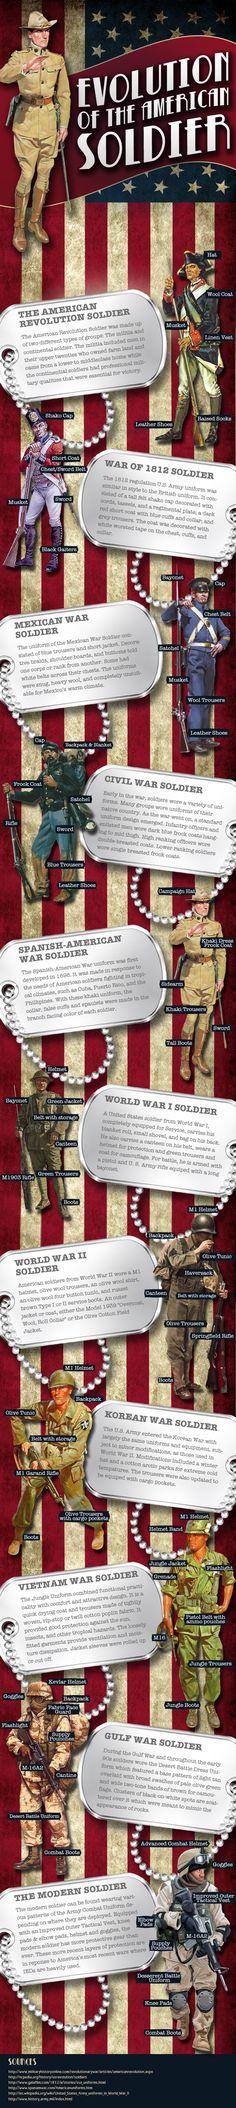 Evolution of the American Soldier's Uniform - original content here - http://www.lowvarates.com/va-loan-blog/the-evolution-of-the-american-soldiers-uniform-infographic/